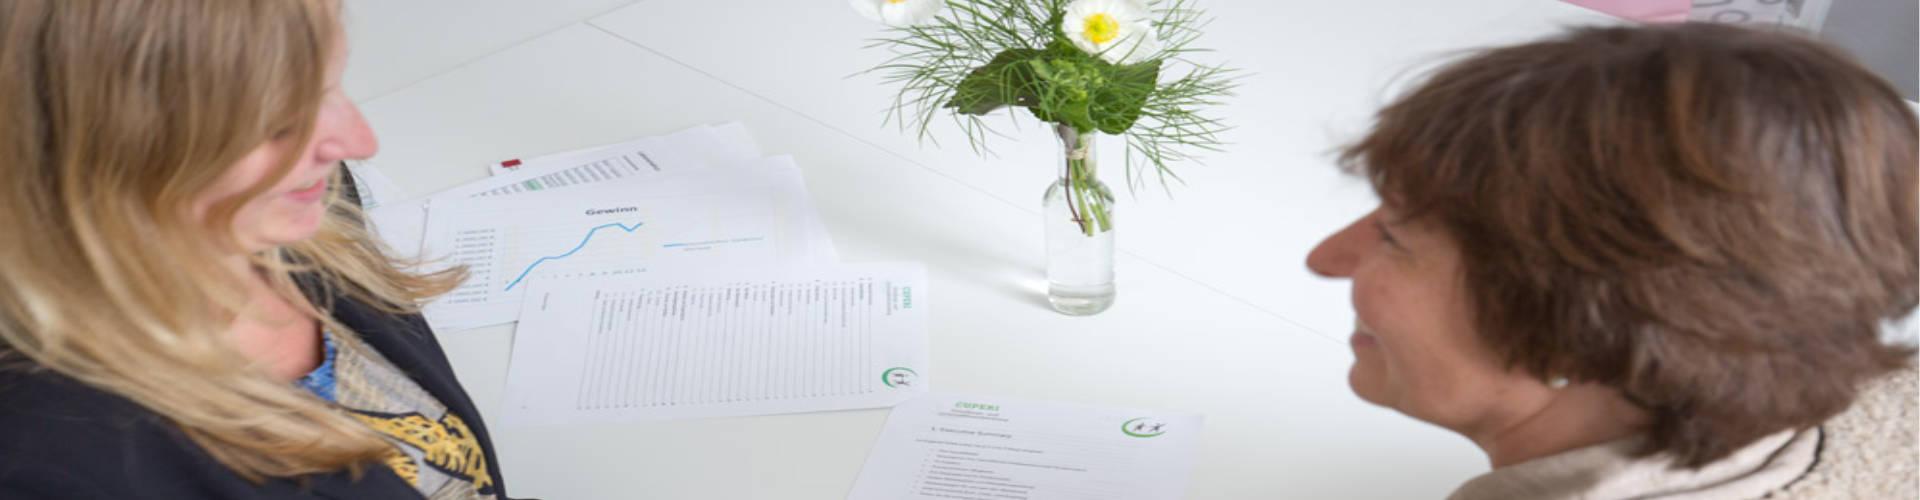 Businessplan Beratung